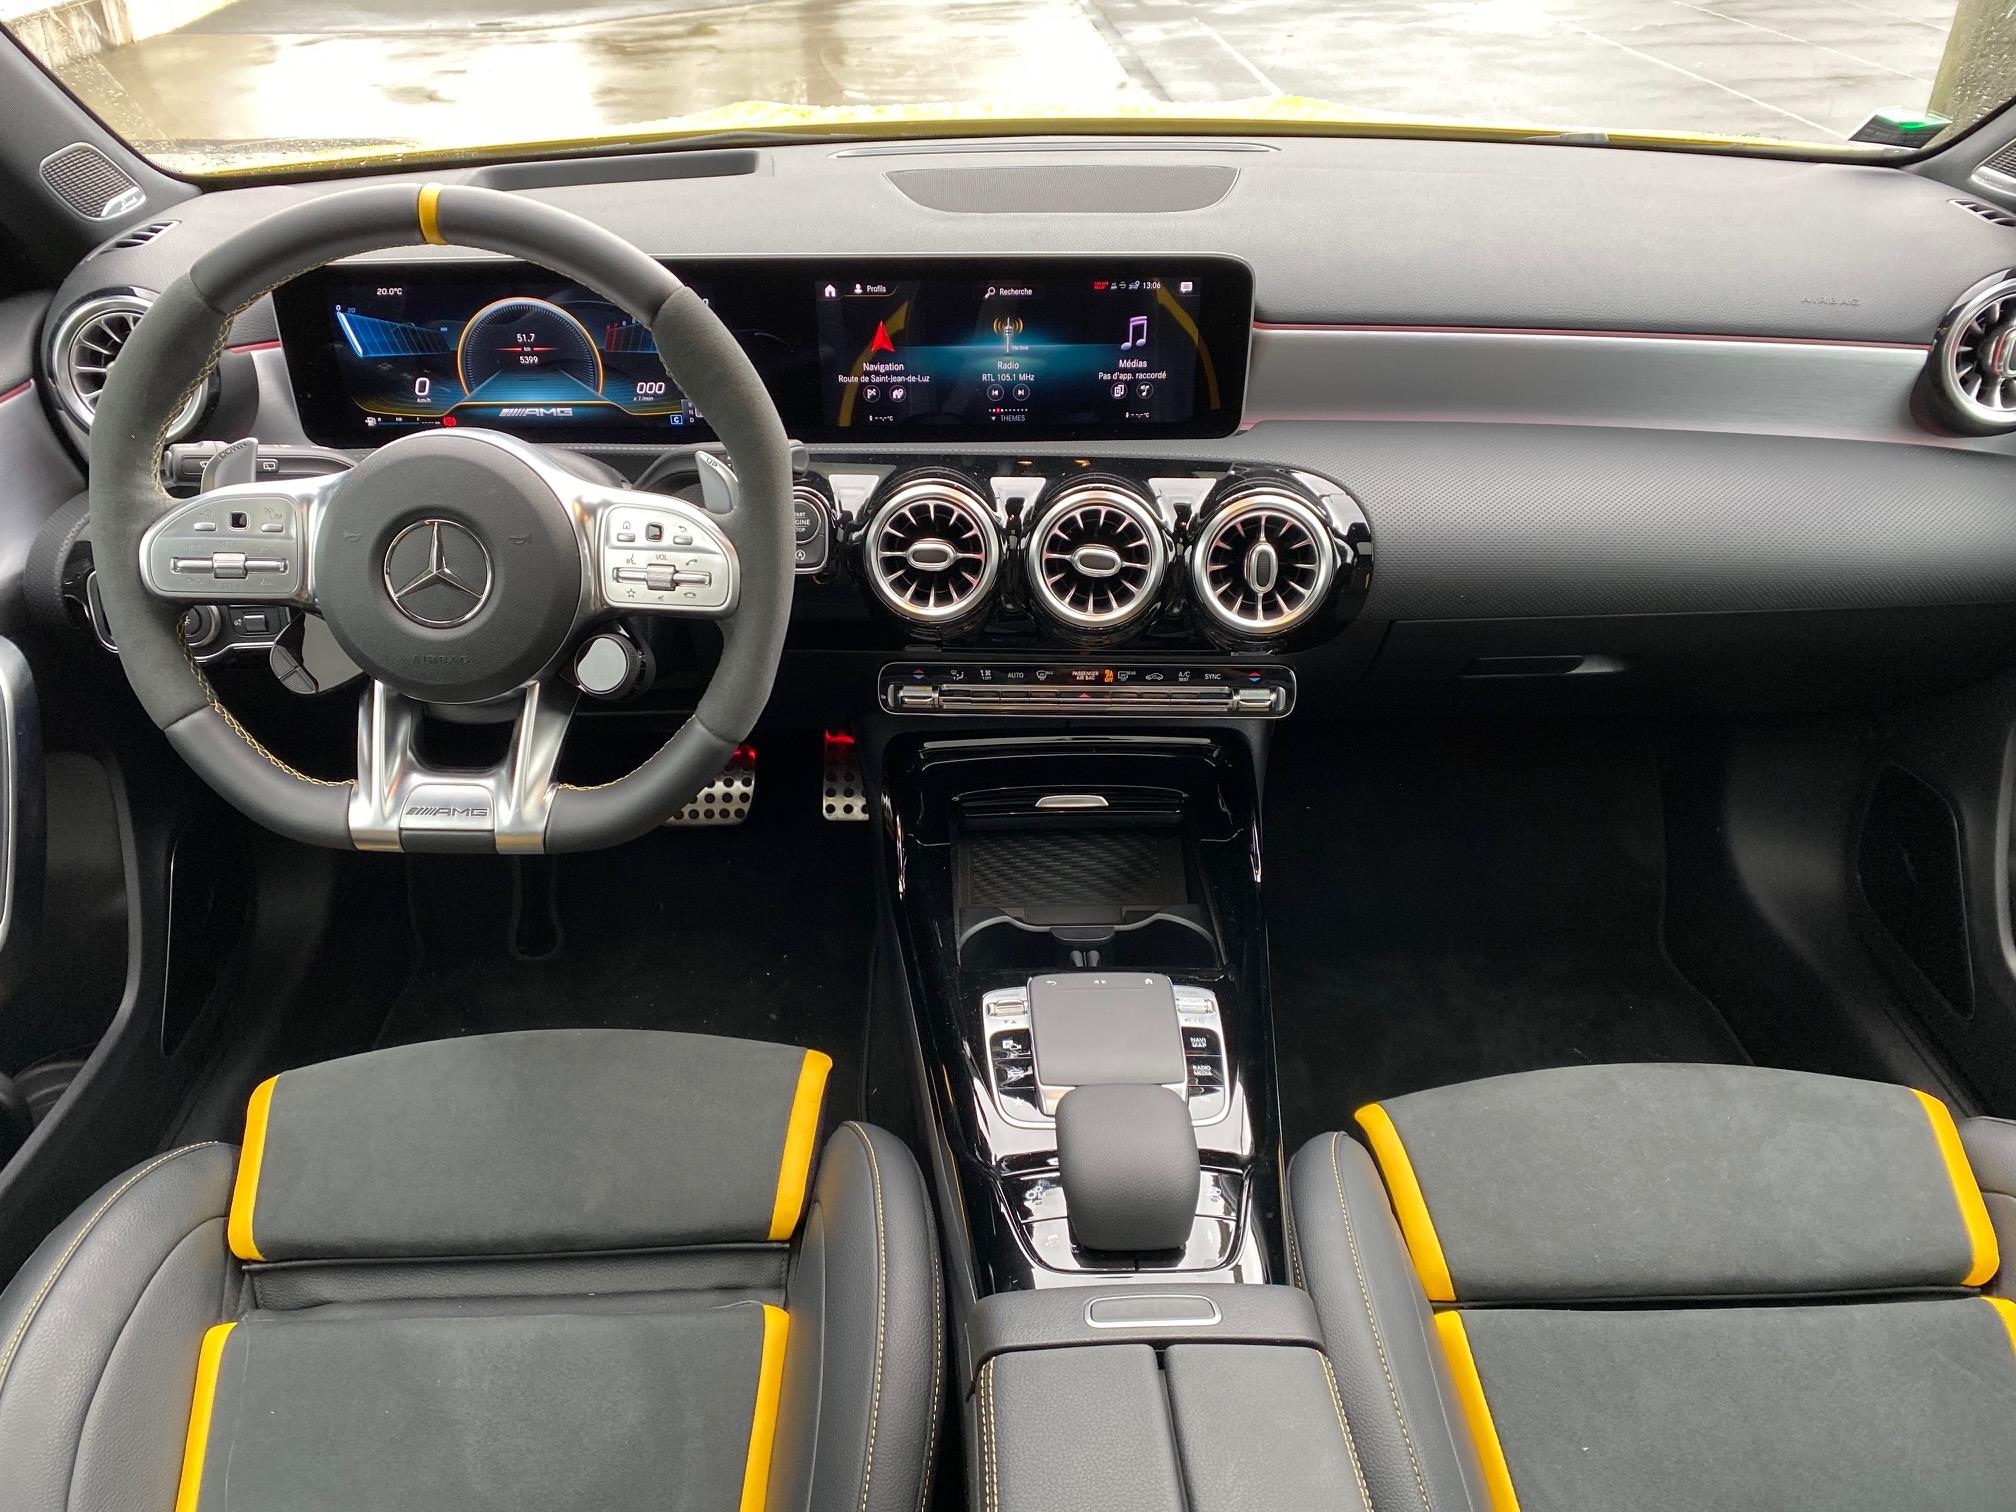 Mercedes, mercedes AMG, compacten compacte sportive, voiture sportive, A 45 S AMG